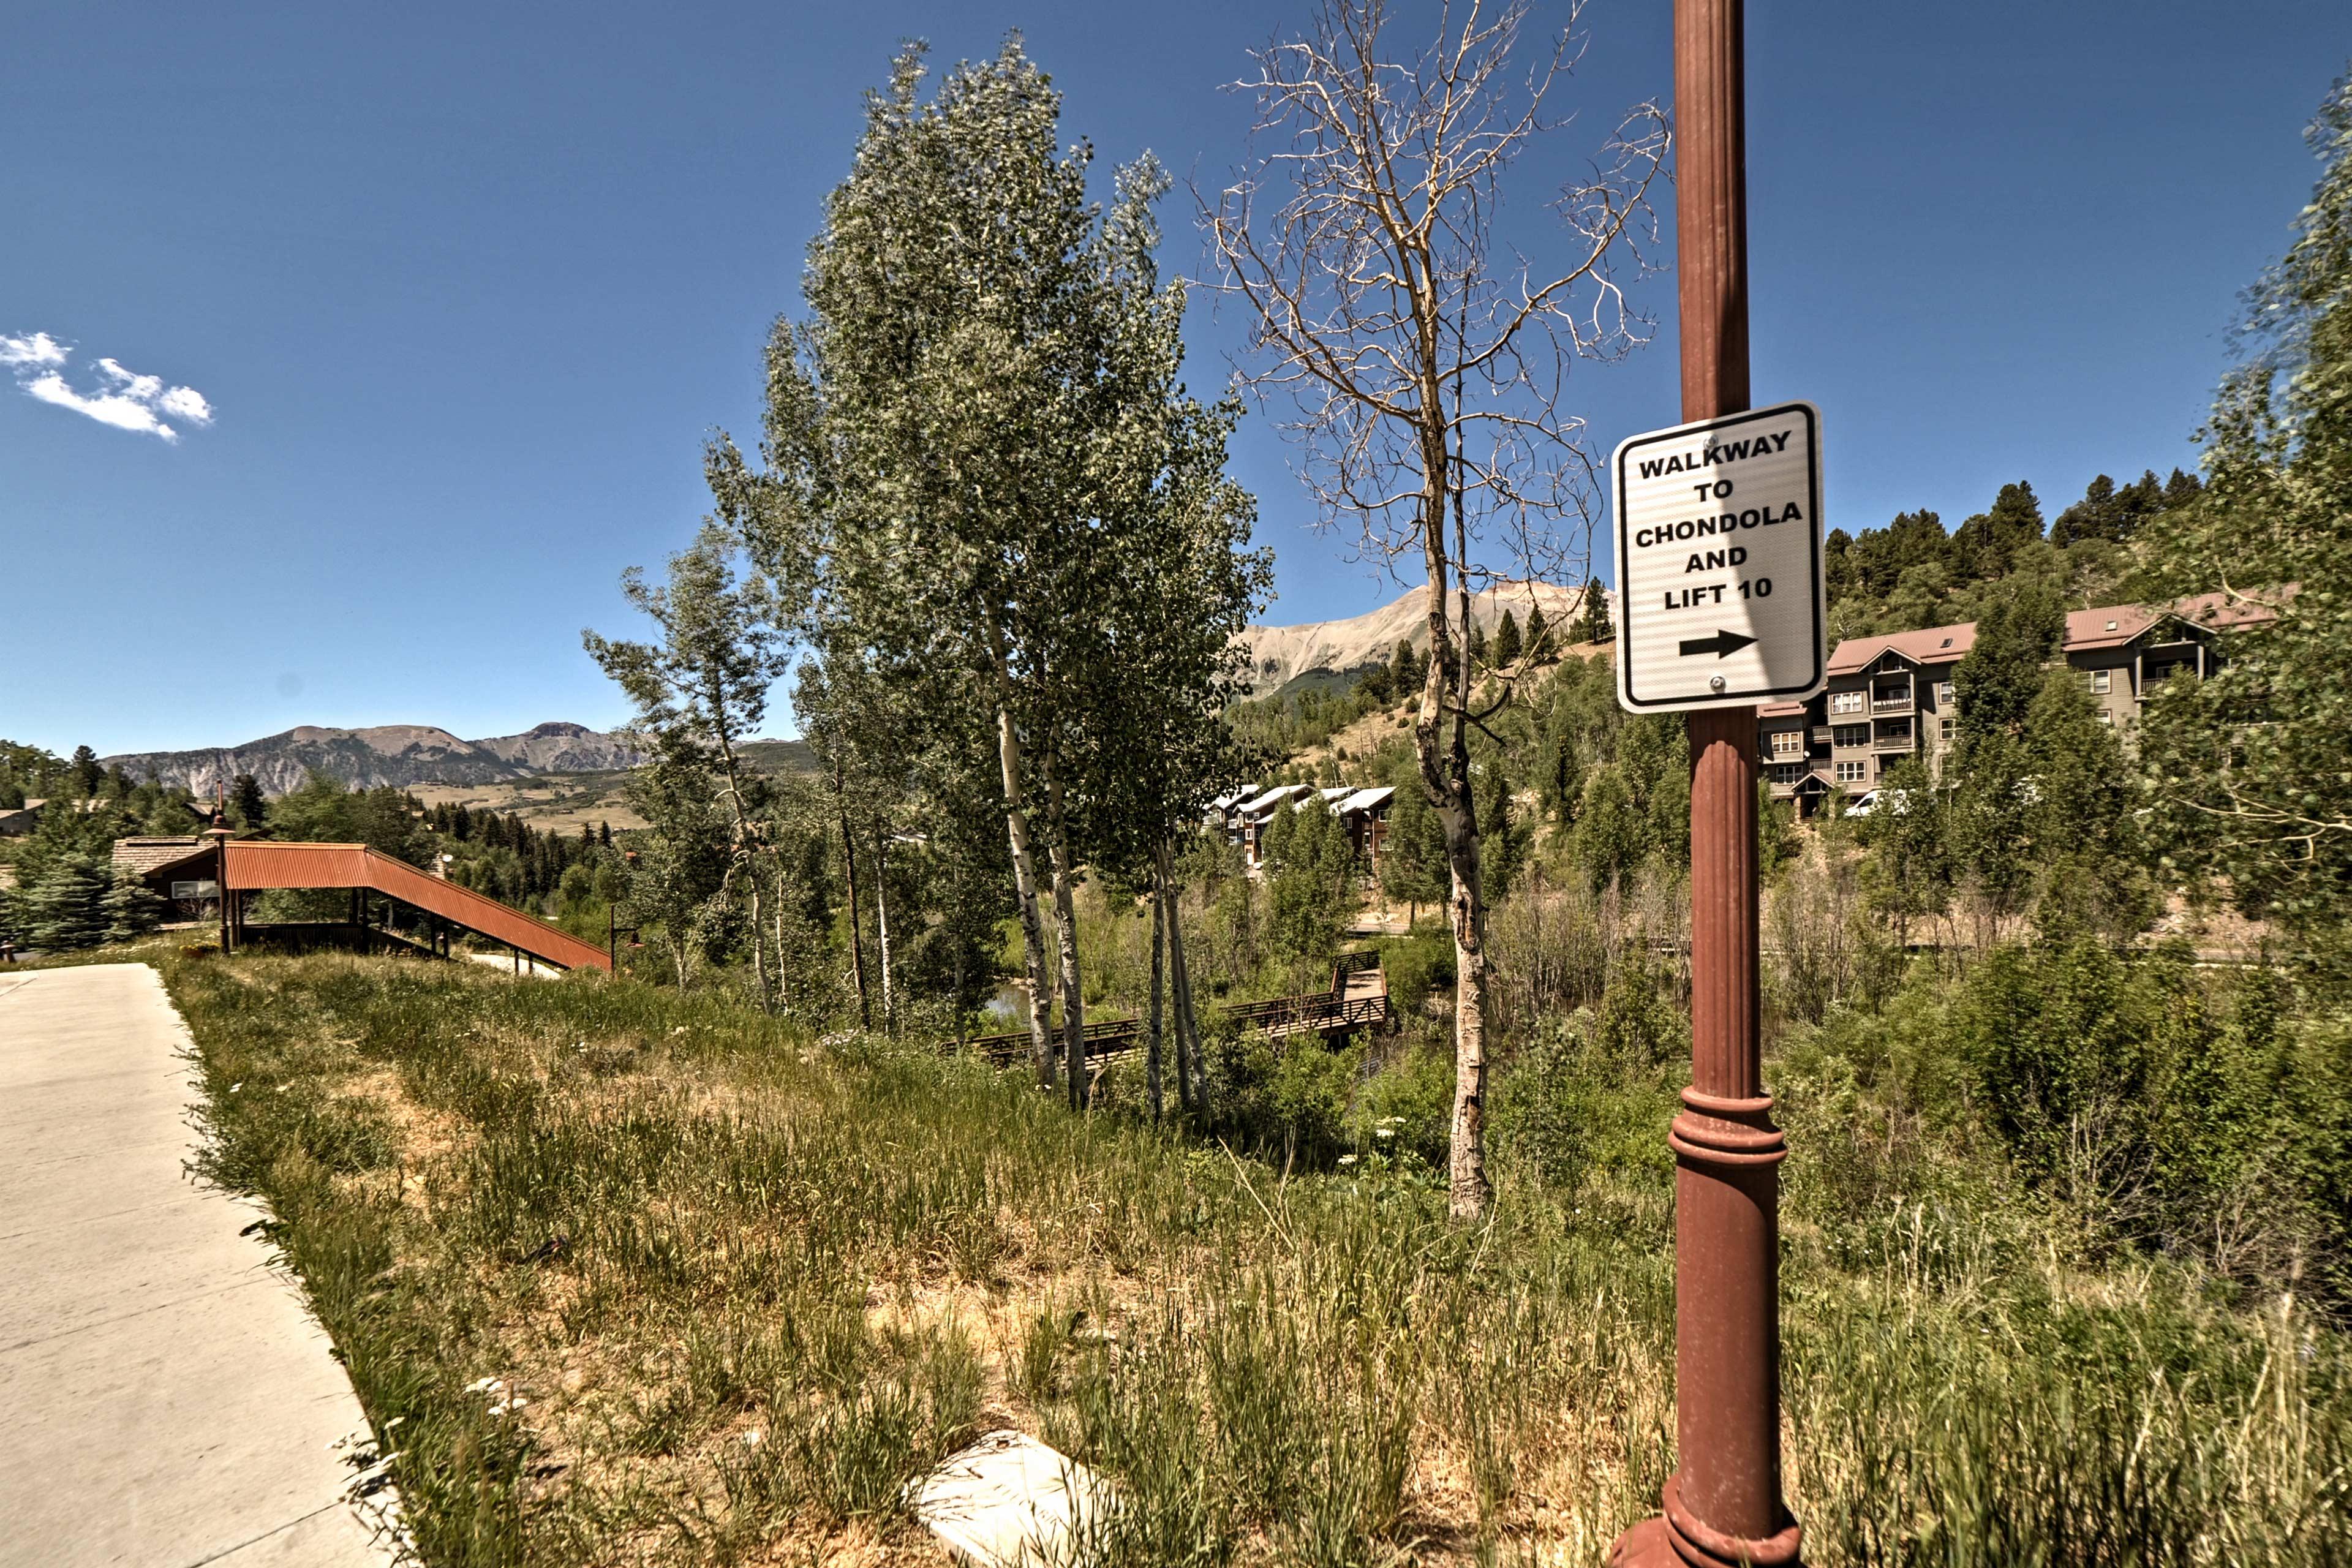 Walk no more than a few blocks to access the ski lifts.